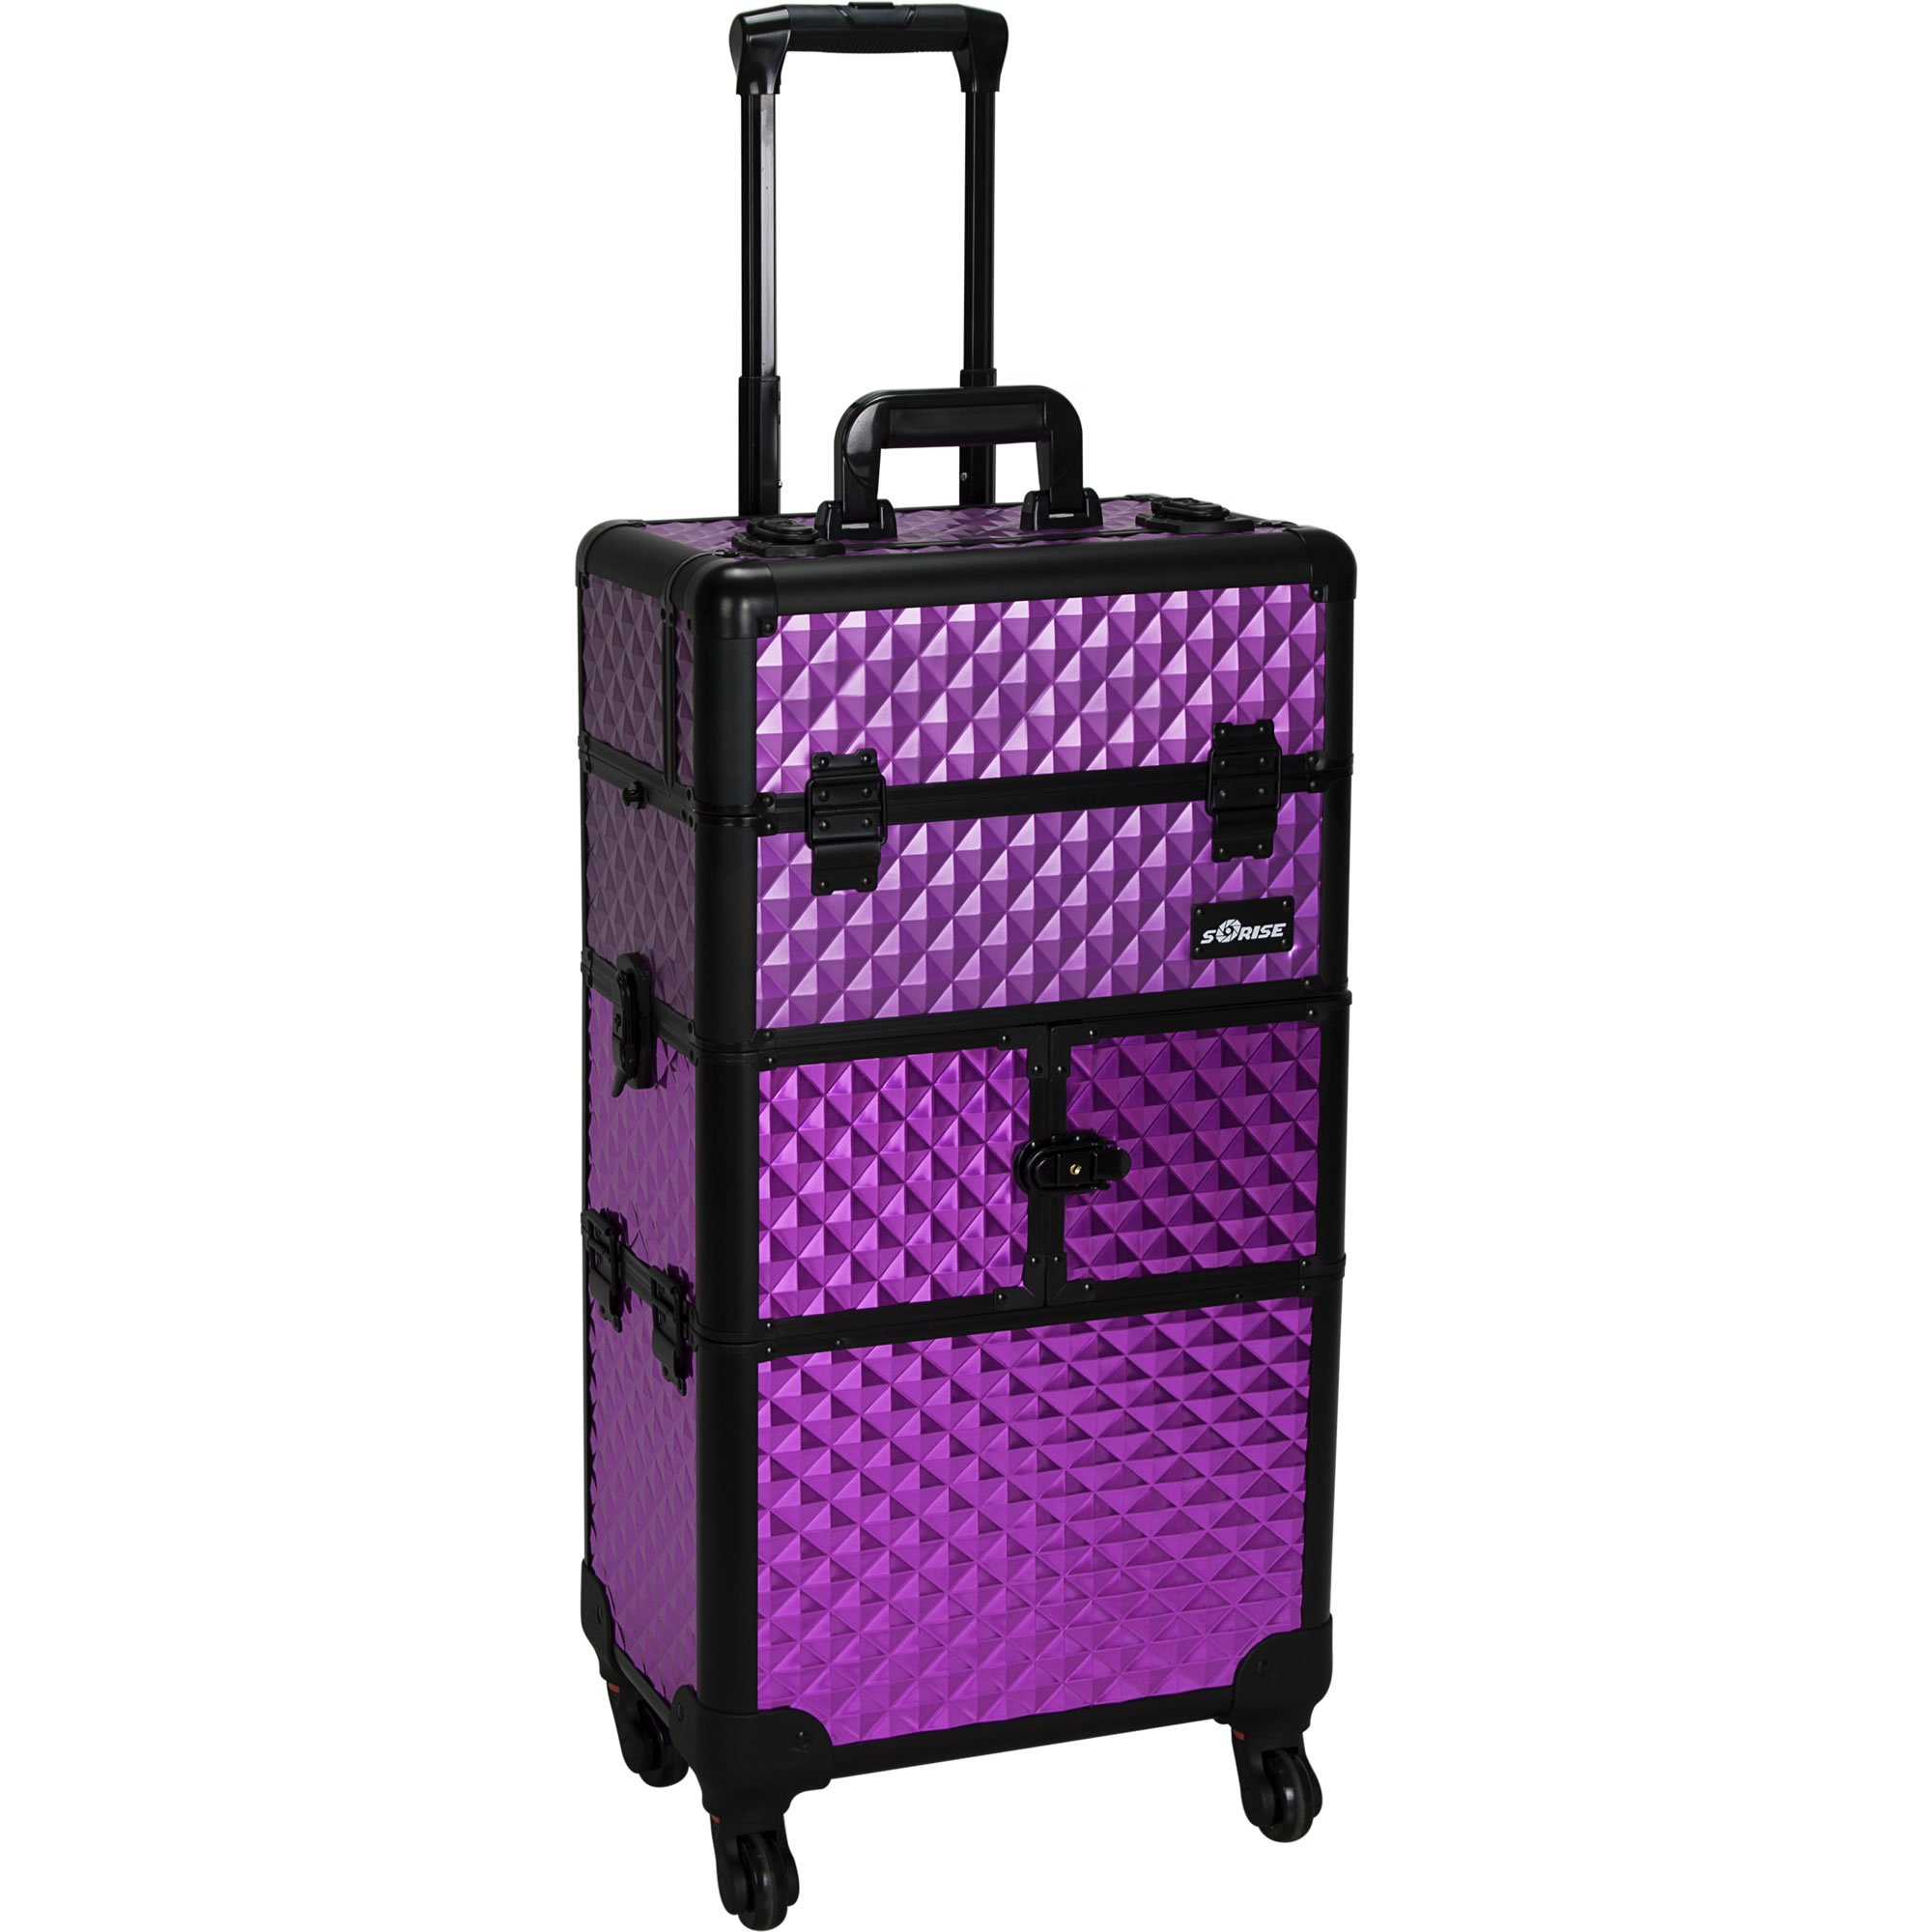 Sunrise Bartolini 2-In-1 Rolling Makeup Case Professional Nail Travel Organizer Box, Purple Diamond, 21 Pound